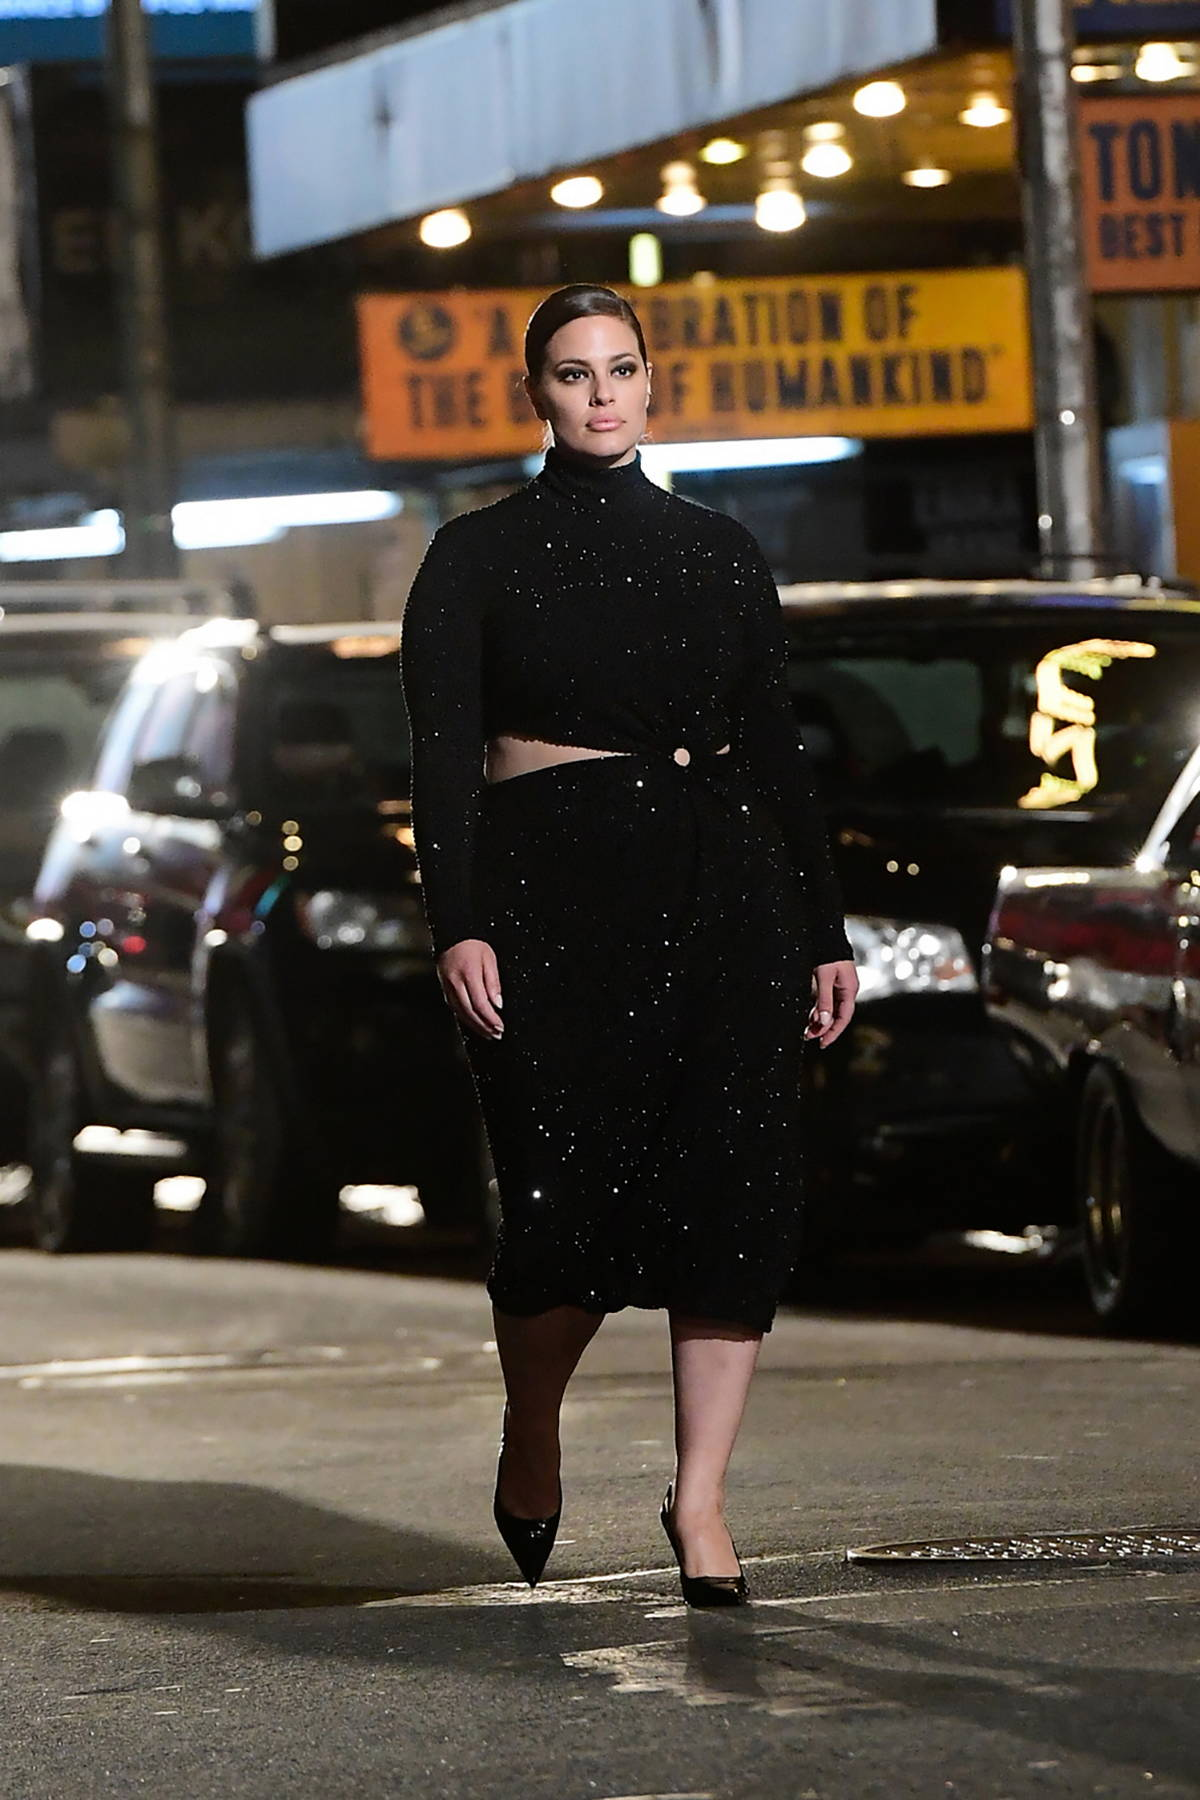 Ashley Graham walks the runway for Michael Kors 2021 Fashion Show in New York City